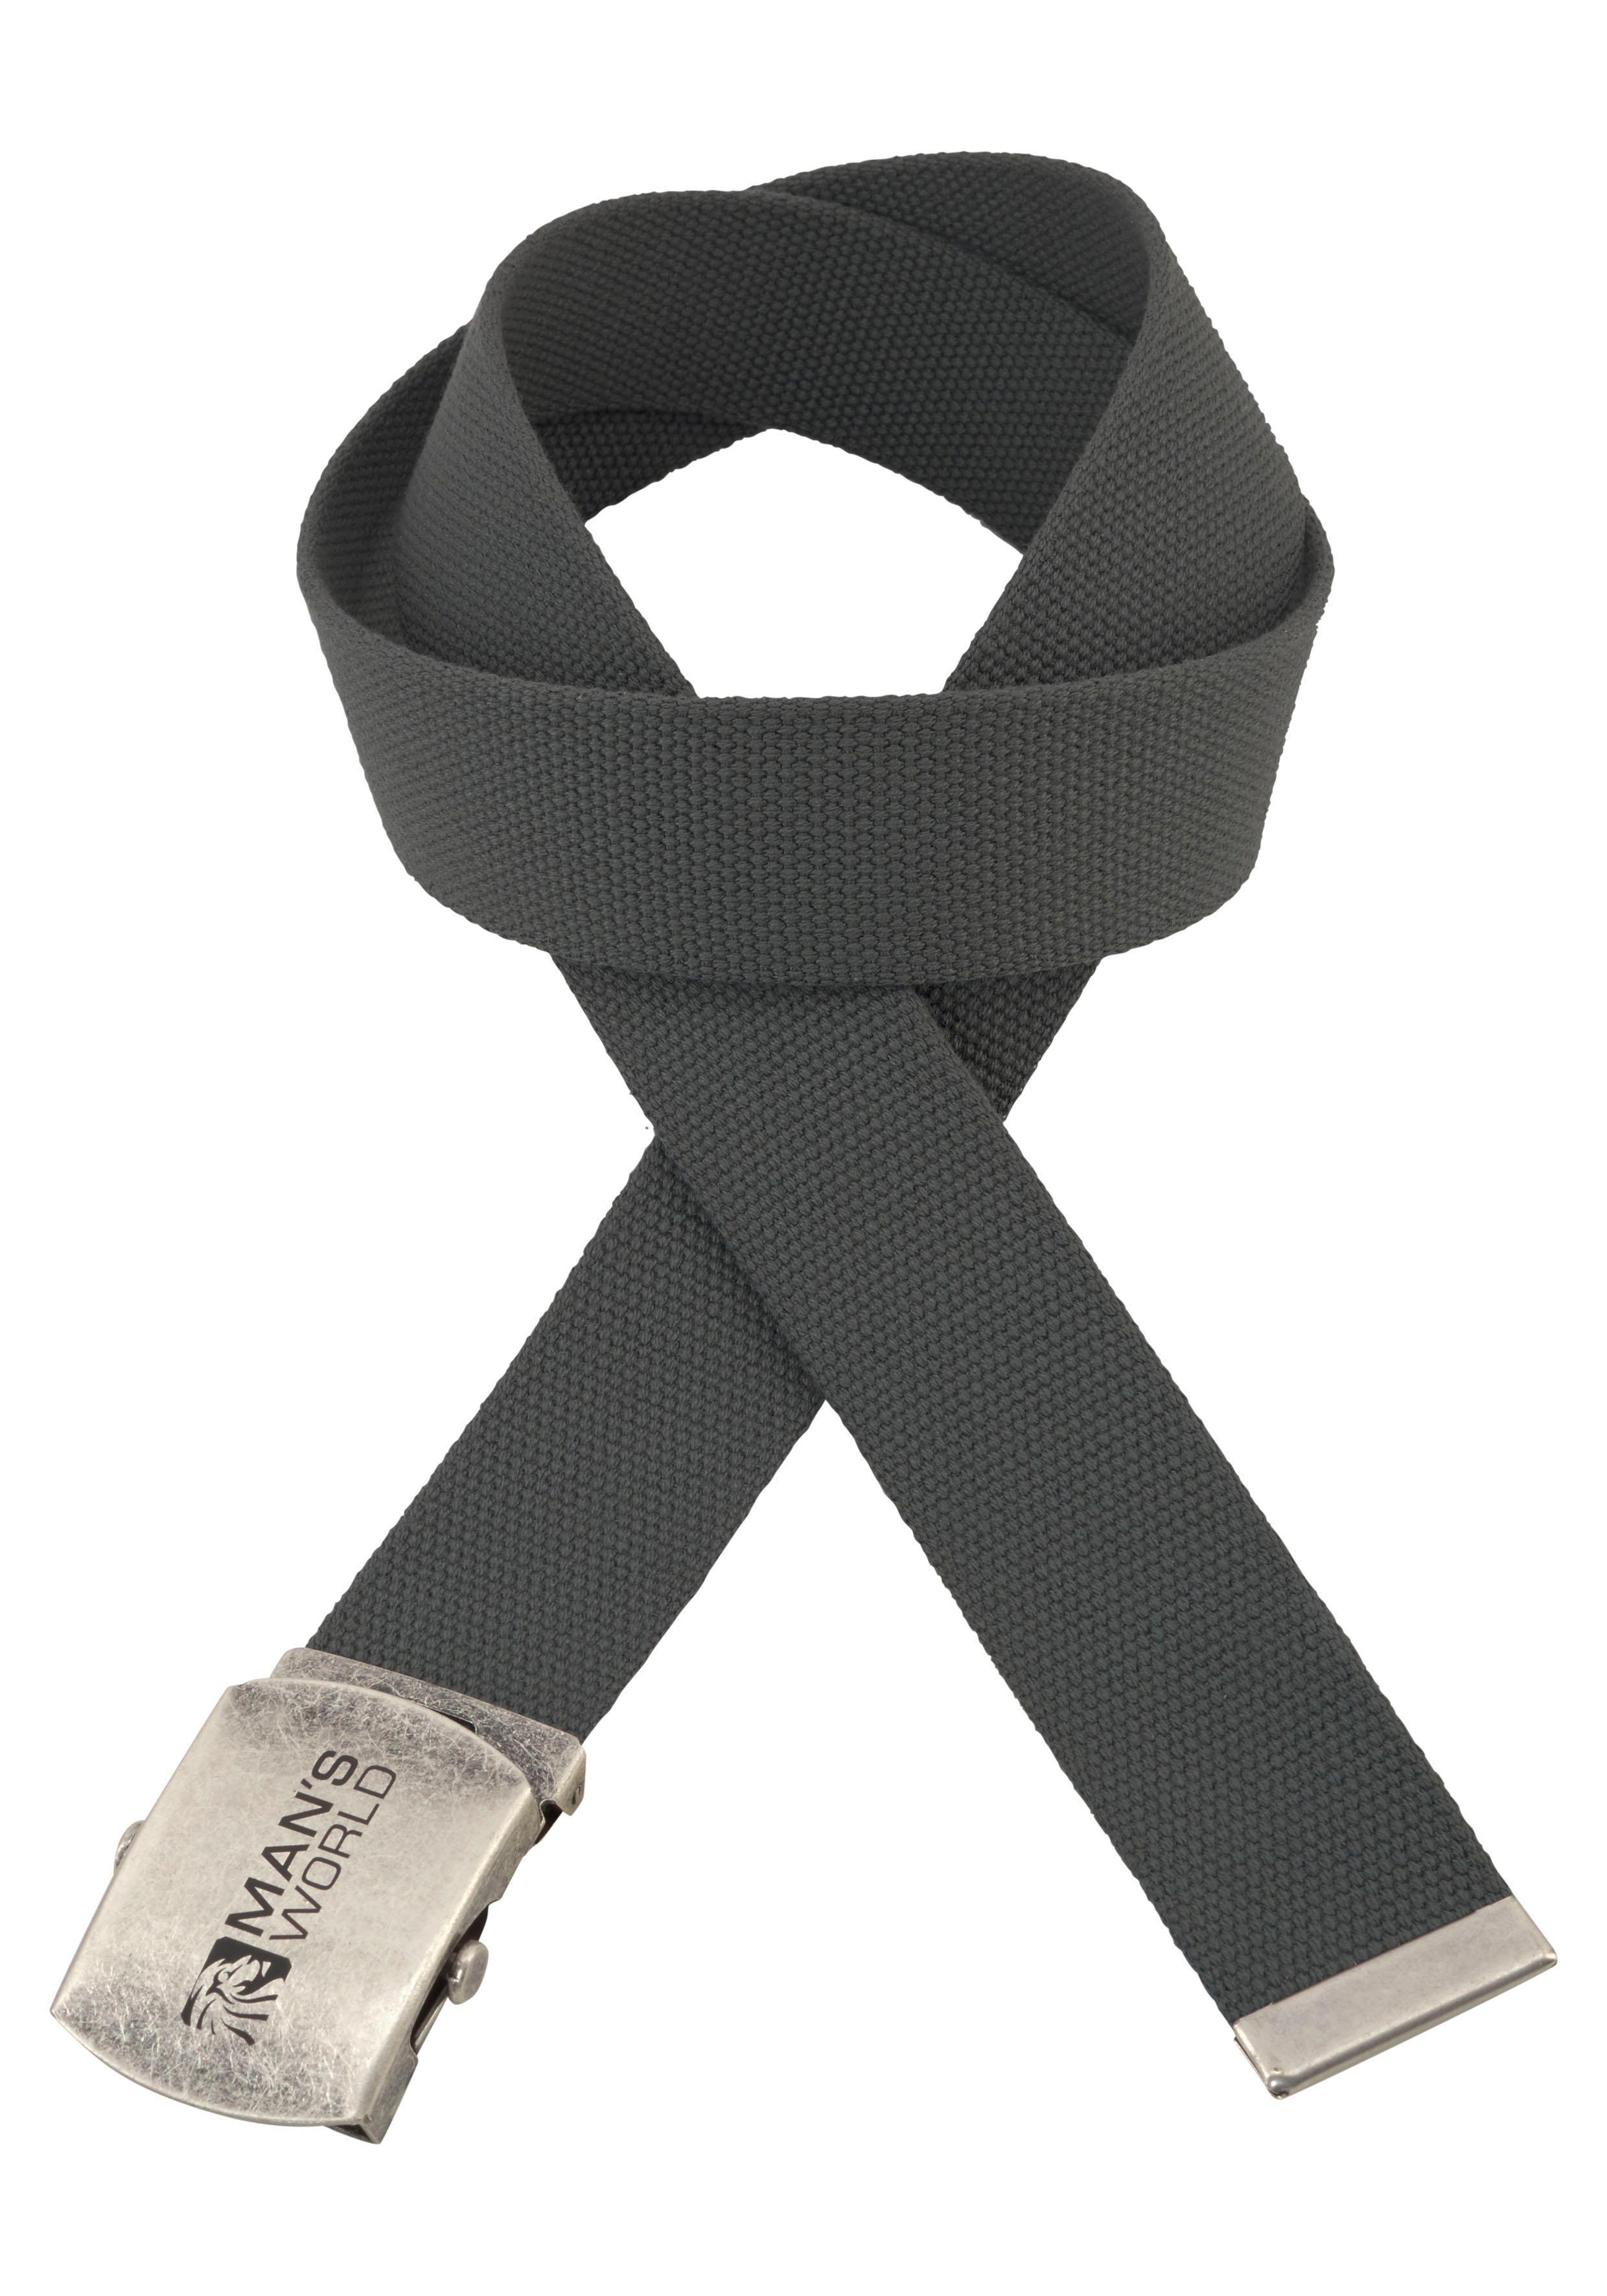 Man's World Stoffgürtel, Mit Koppelschließe, Textilbandgürtel grau Damen Koppelgürtel Gürtel Accessoires Stoffgürtel